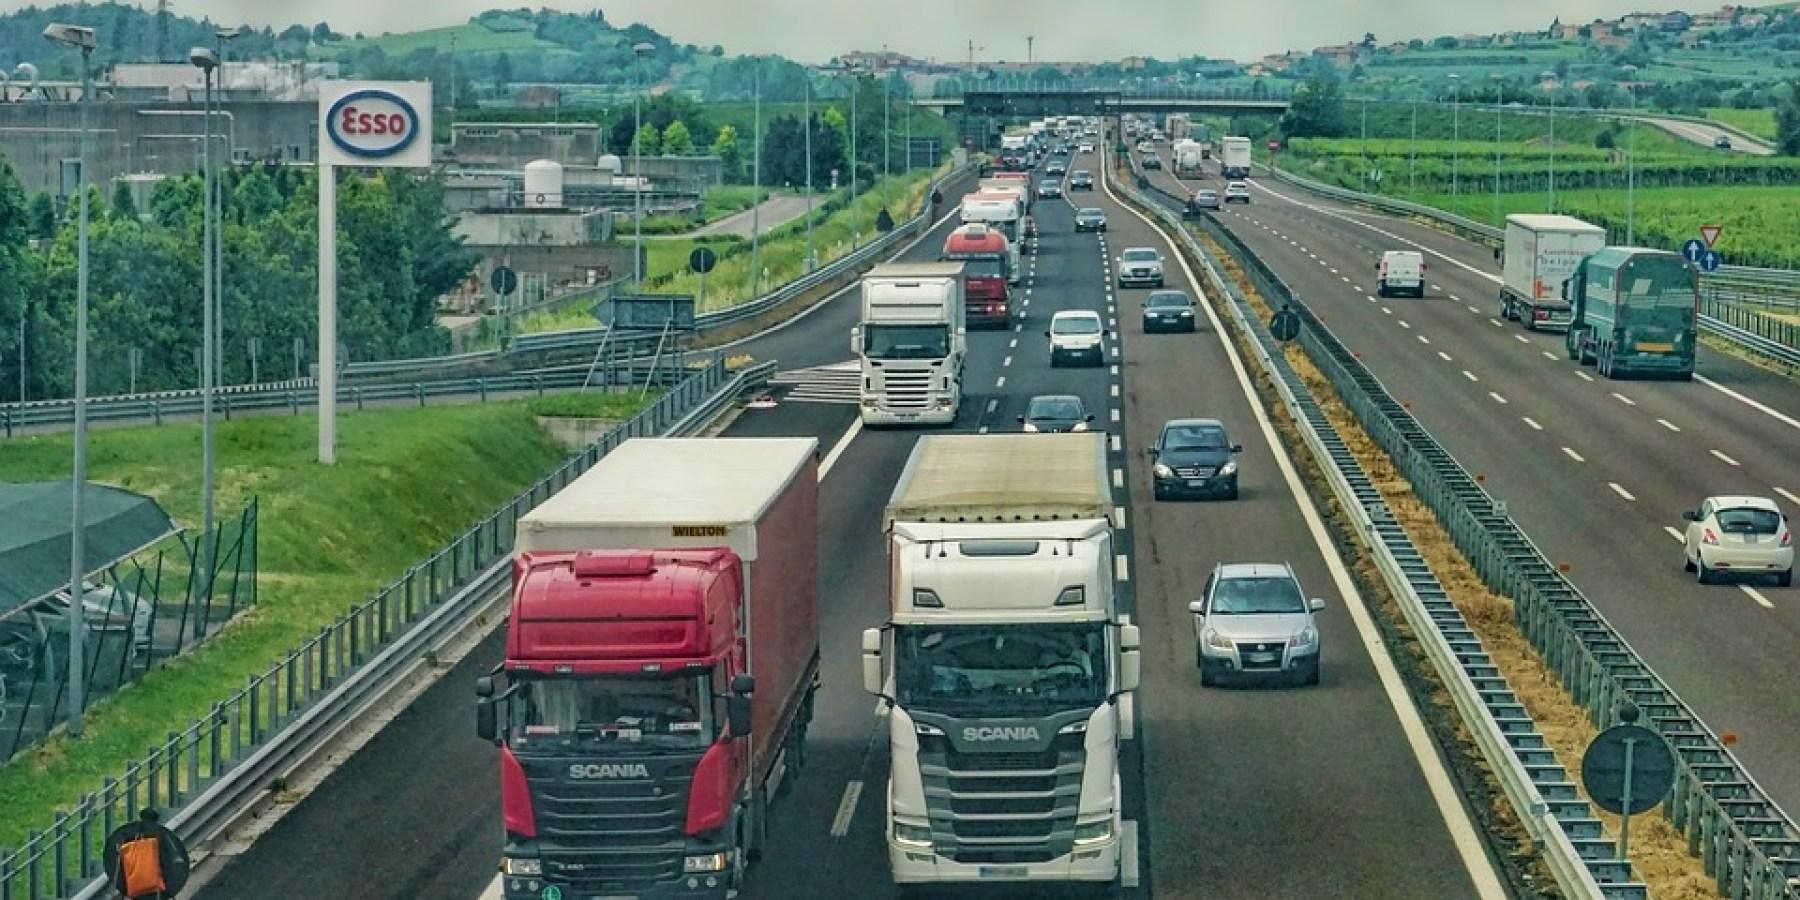 Transporter muss Zwangspause einlegen – Fahrer unter Kokaineinfluß